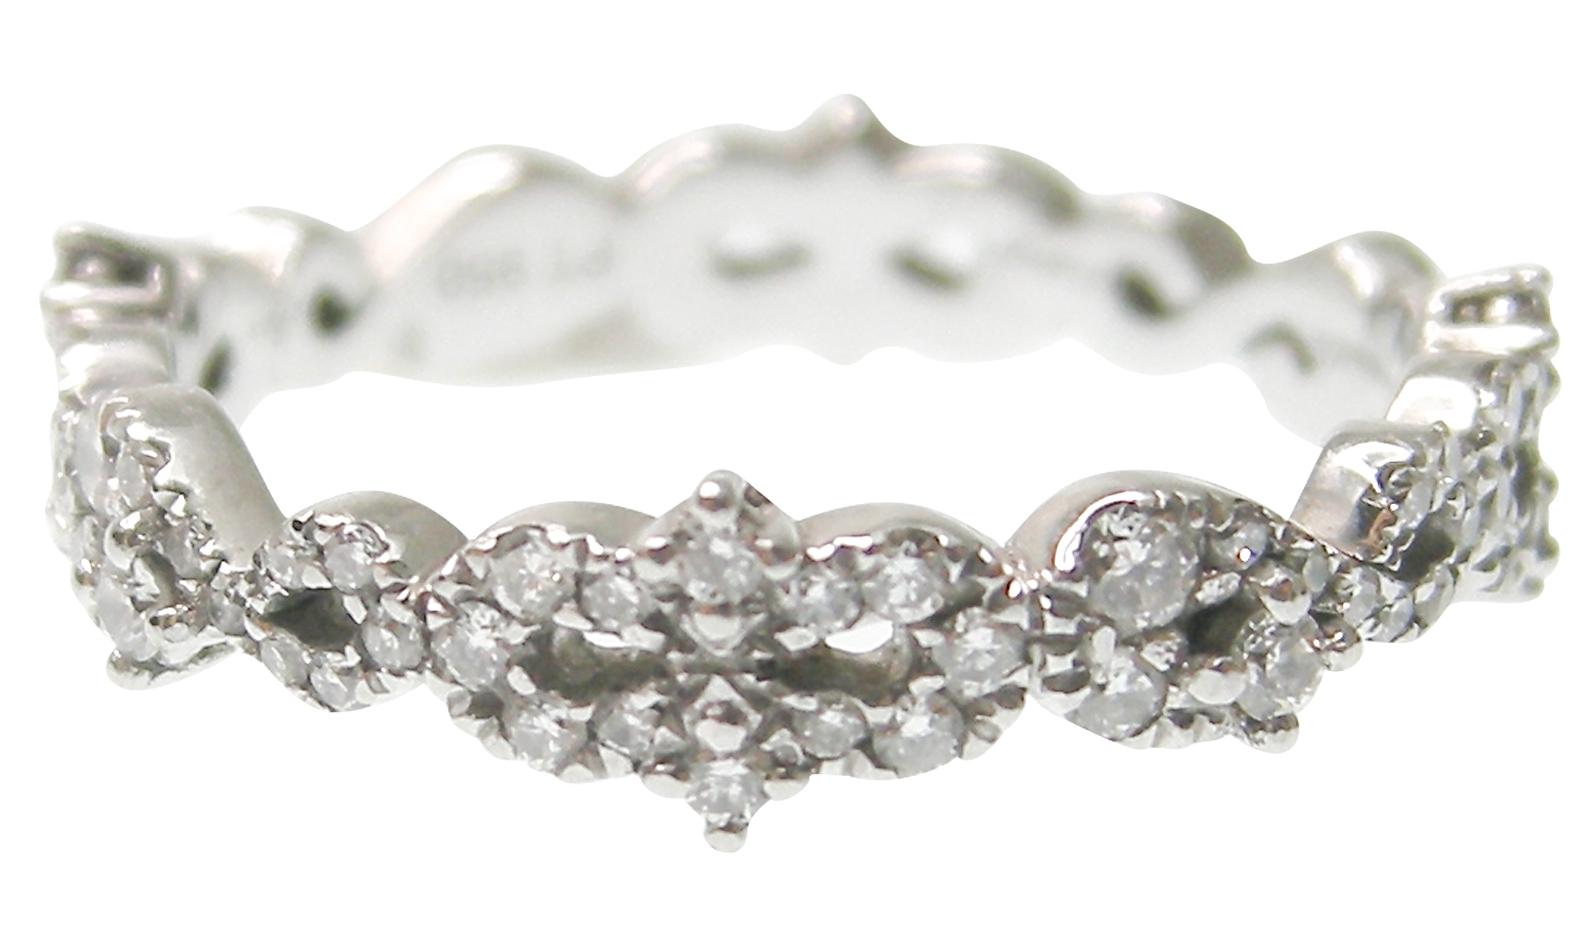 DIAMOND ETERNITY BAND ANTIQUE STYLE BESPOKE FINE JEWELLERY BY SHAHINA HATTA